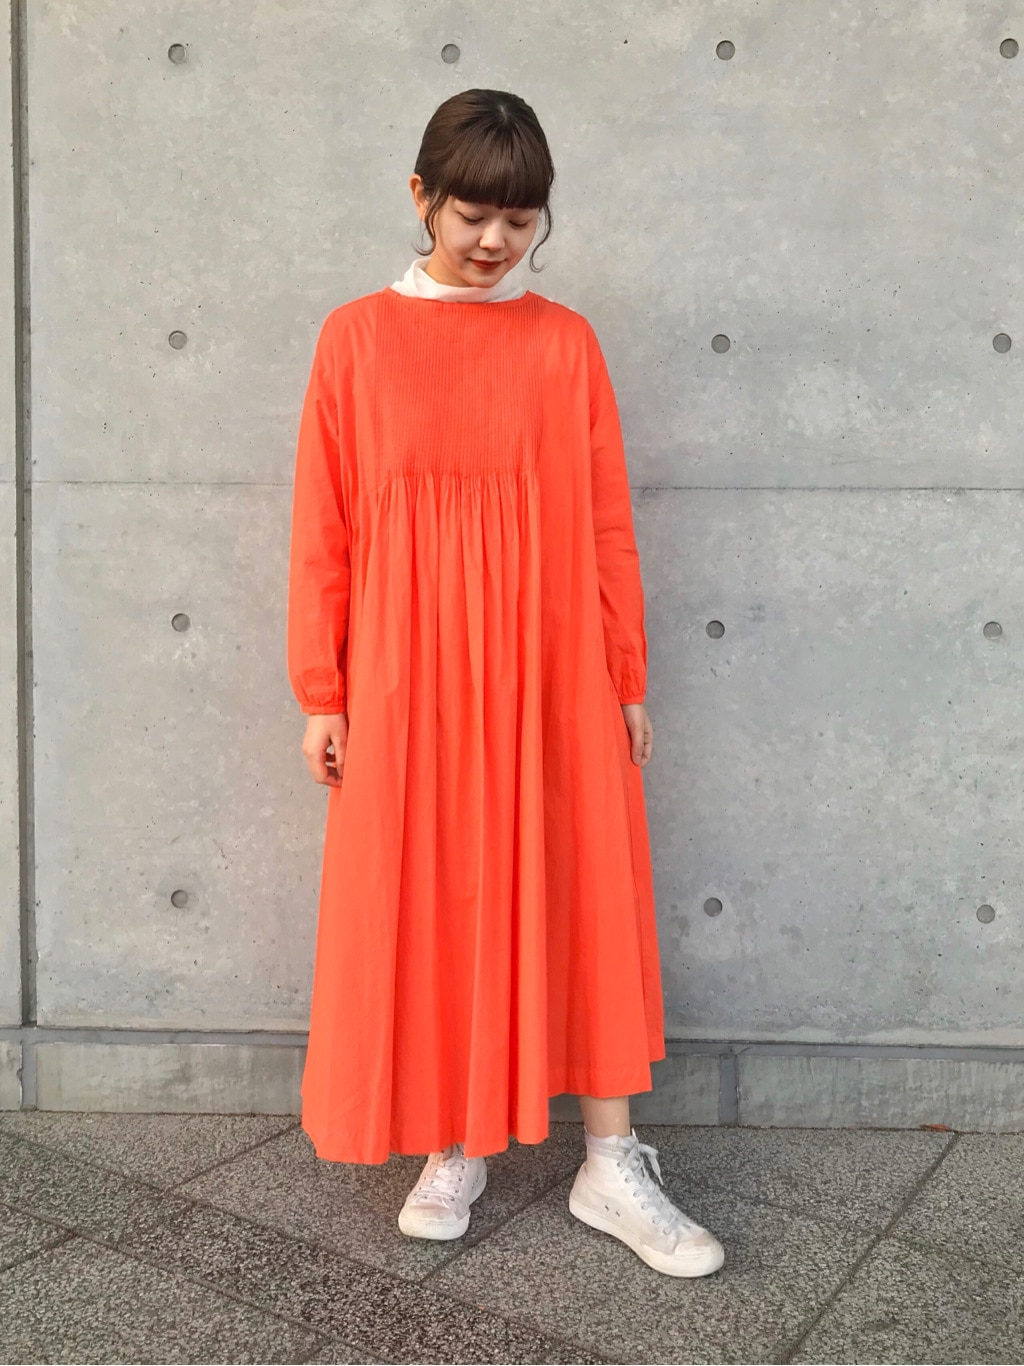 l'atelier du savon 新宿ミロード 身長:154cm 2021.02.03